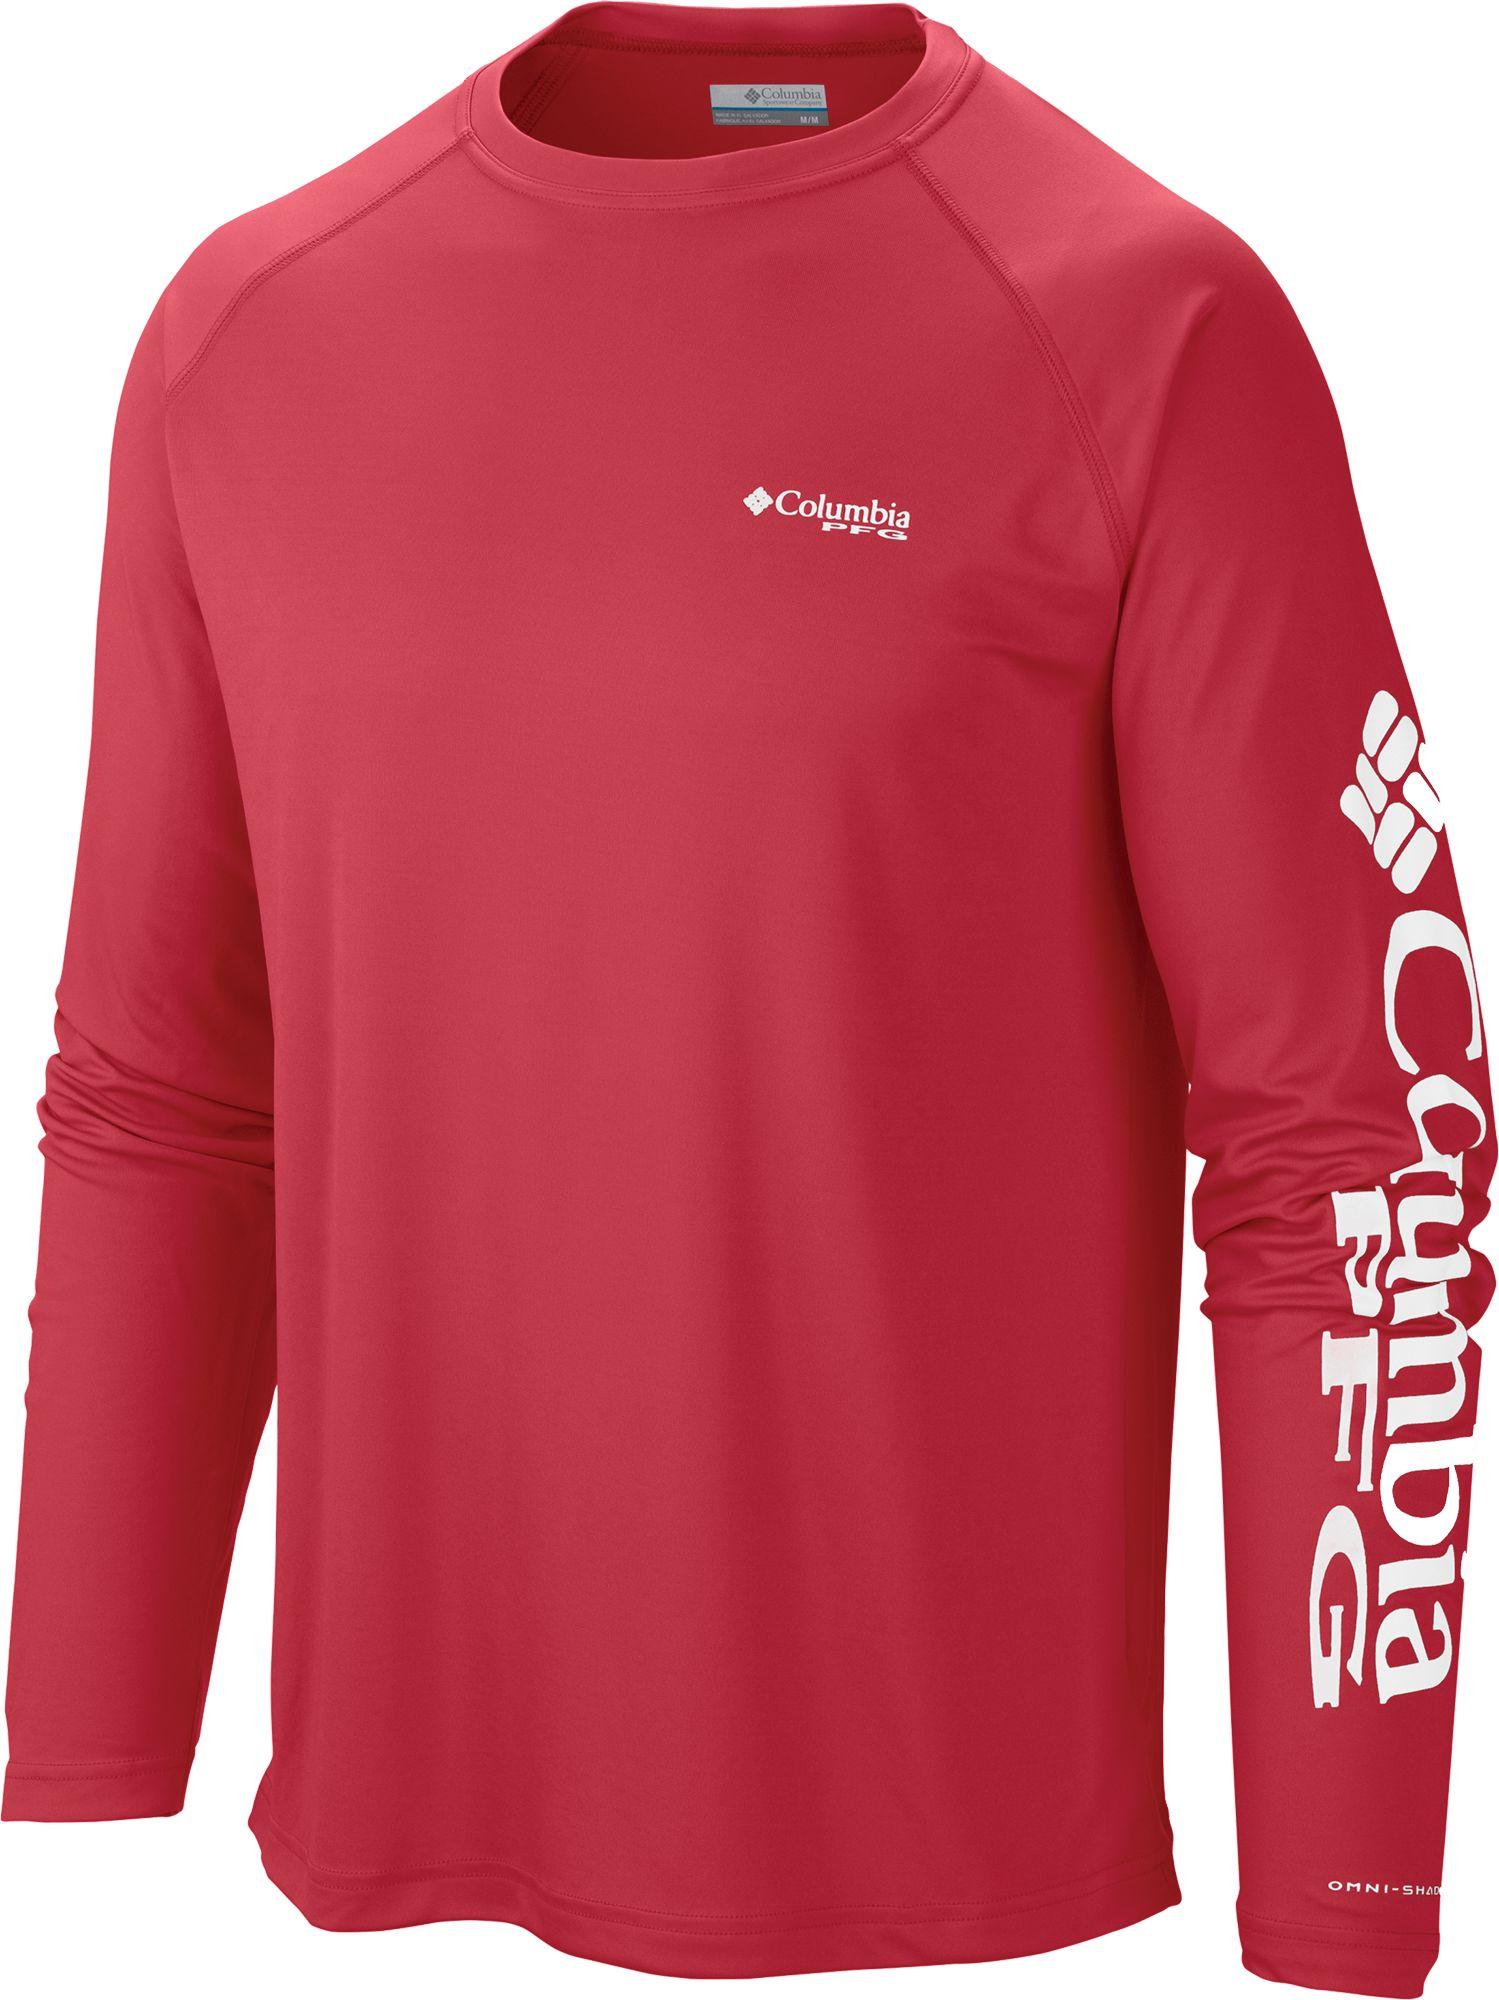 942d9700 Columbia Men's PFG Terminal Tackle Long Sleeve Shirt, Size: 1XL, Red